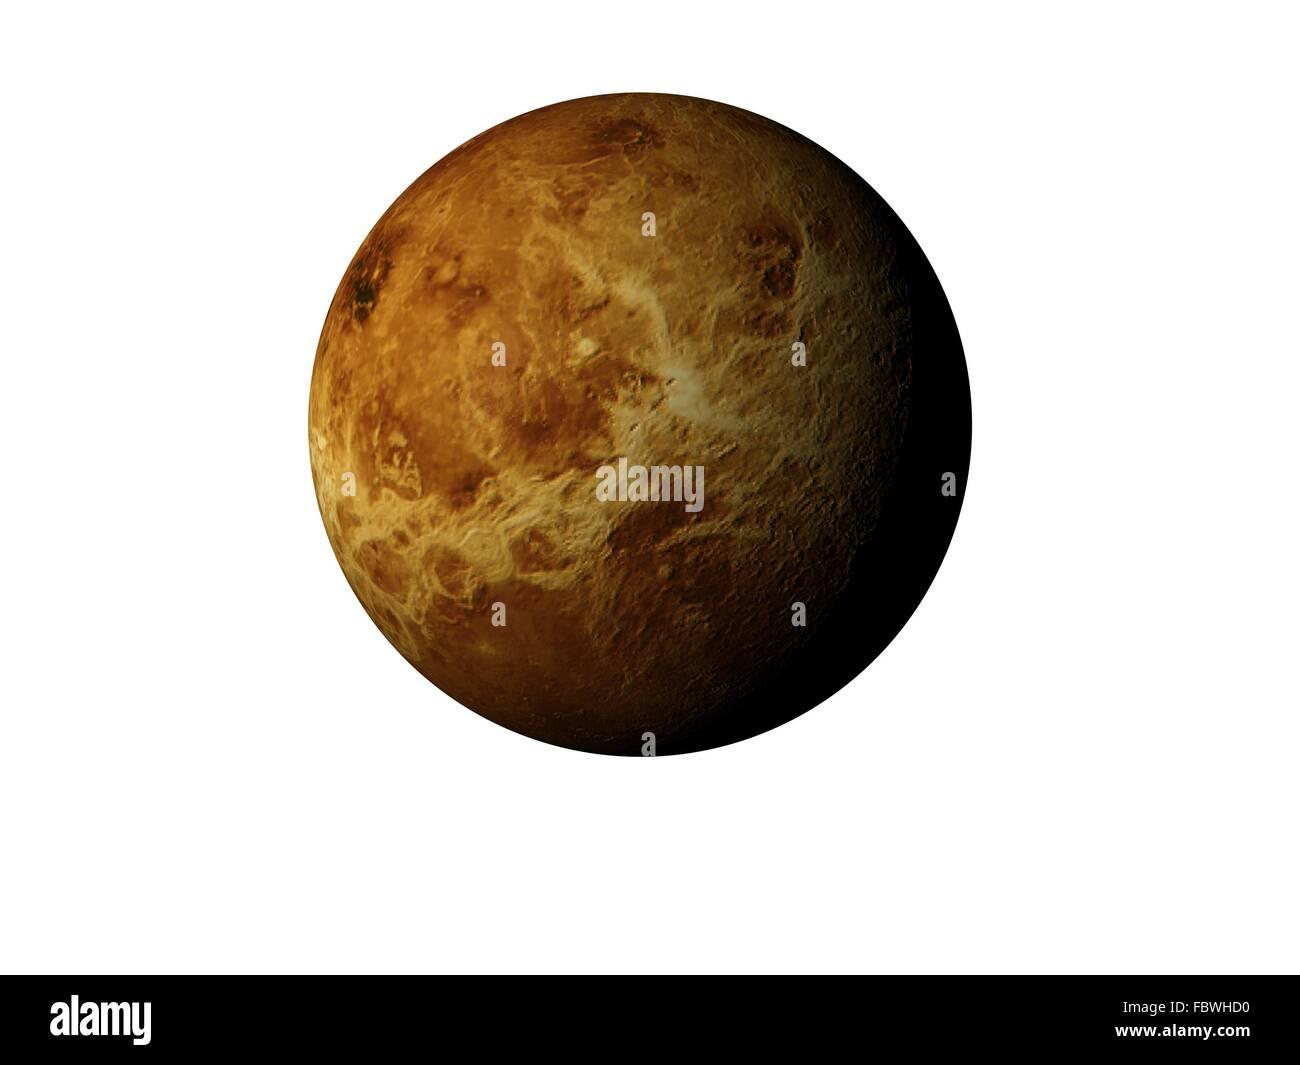 planet venus - Stock Image